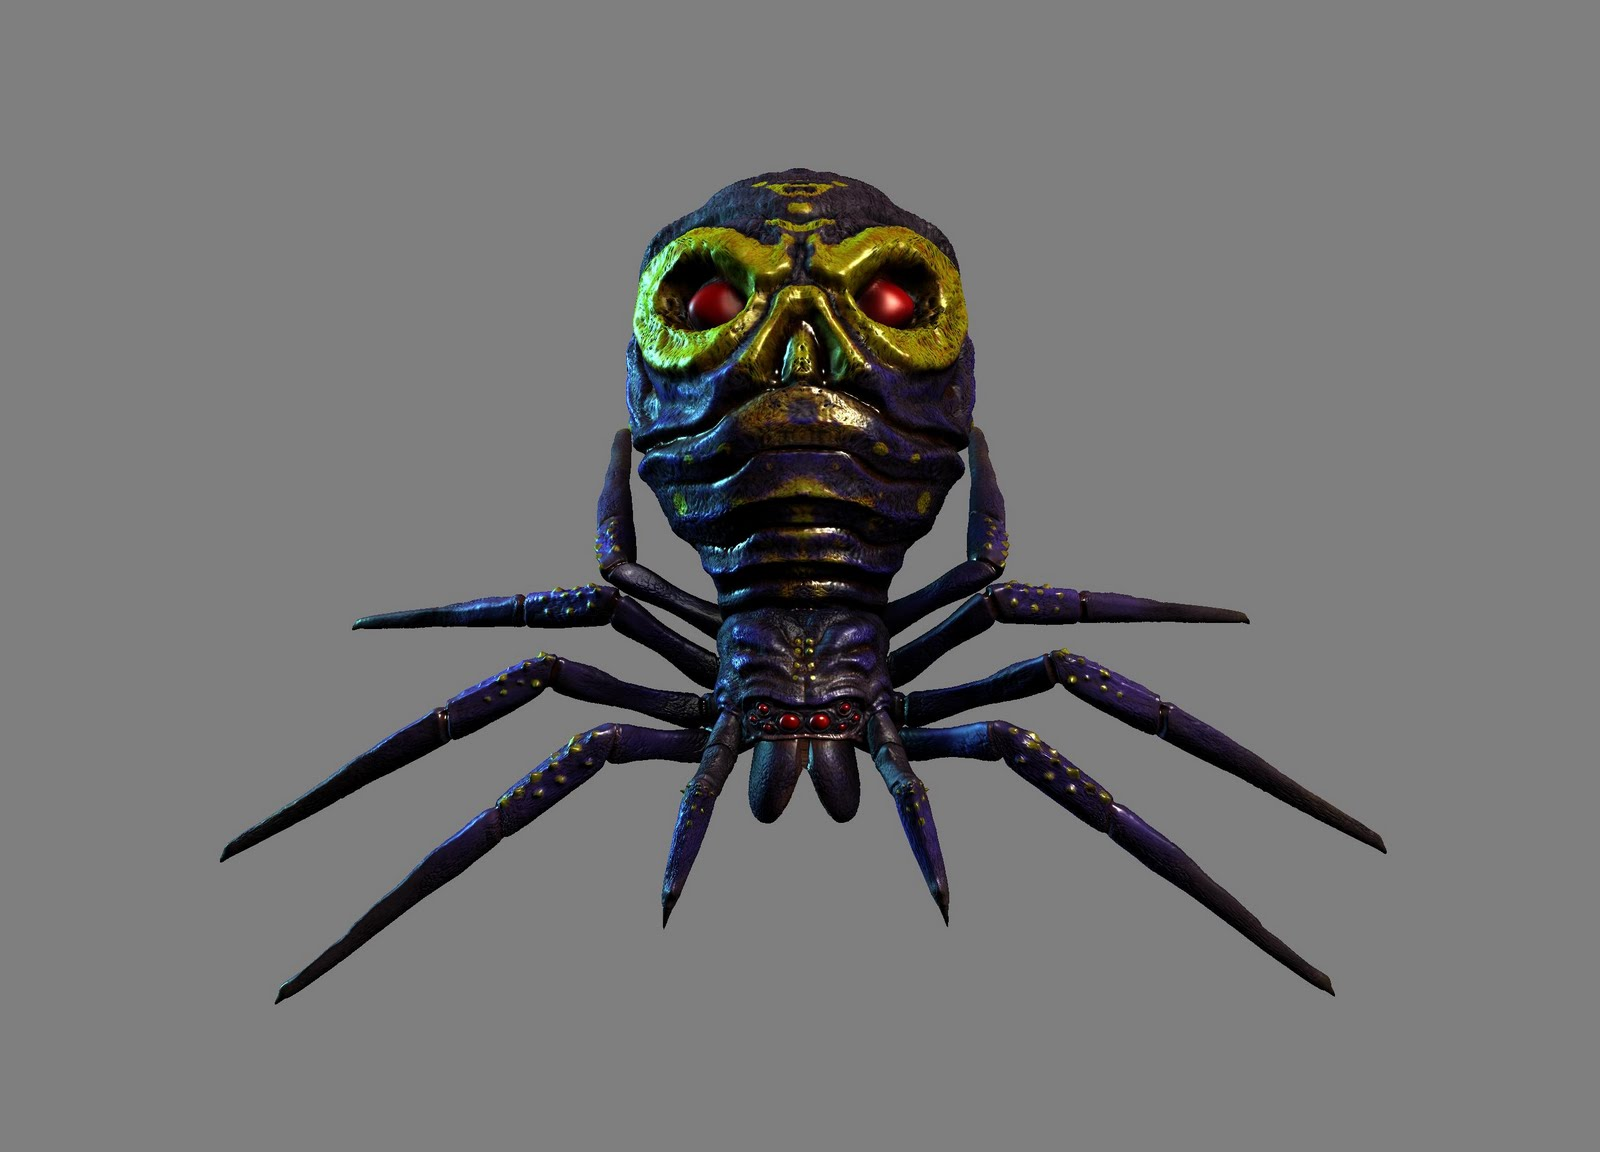 http://4.bp.blogspot.com/_62G9eWS4FfQ/TFyaPjT_Y6I/AAAAAAAAACc/Hp2SpHK2UXc/s1600/spiderSkull.jpg